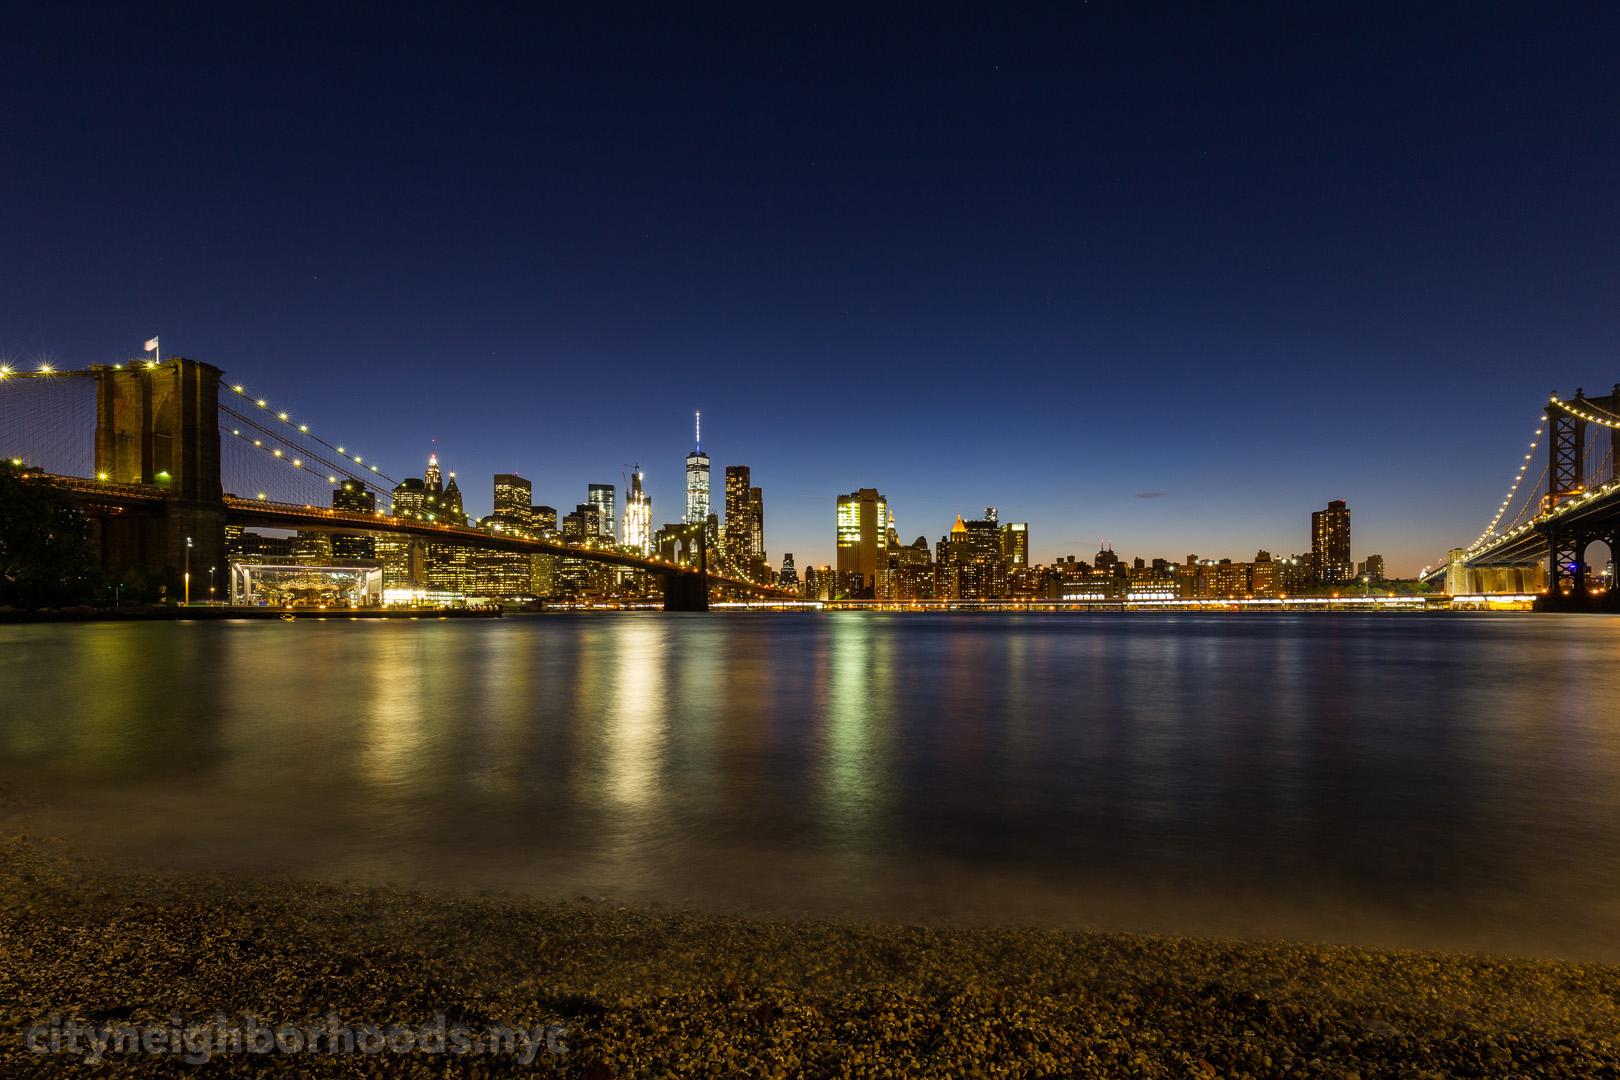 Lower Manhattan - From DUMBO - Brooklyn